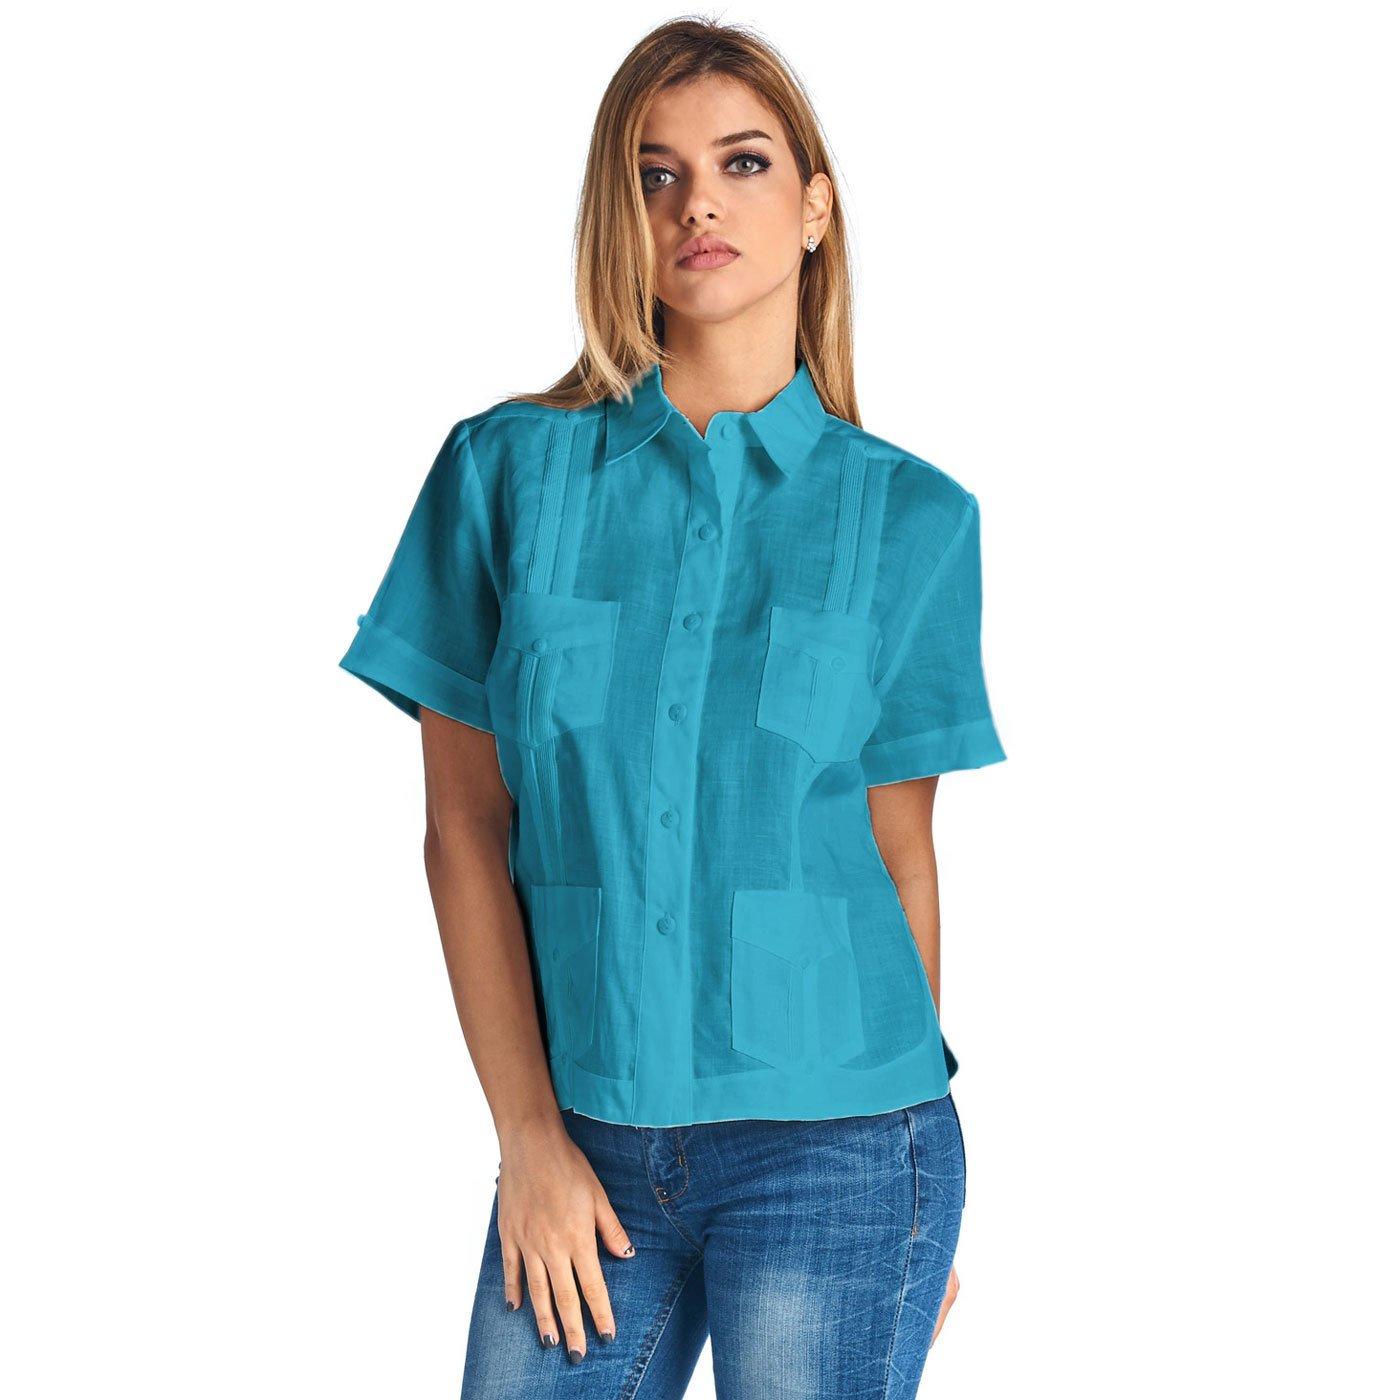 Mojito Lady 100% Linen Gyatabera Short Sleeve Top Aqua Size Medium